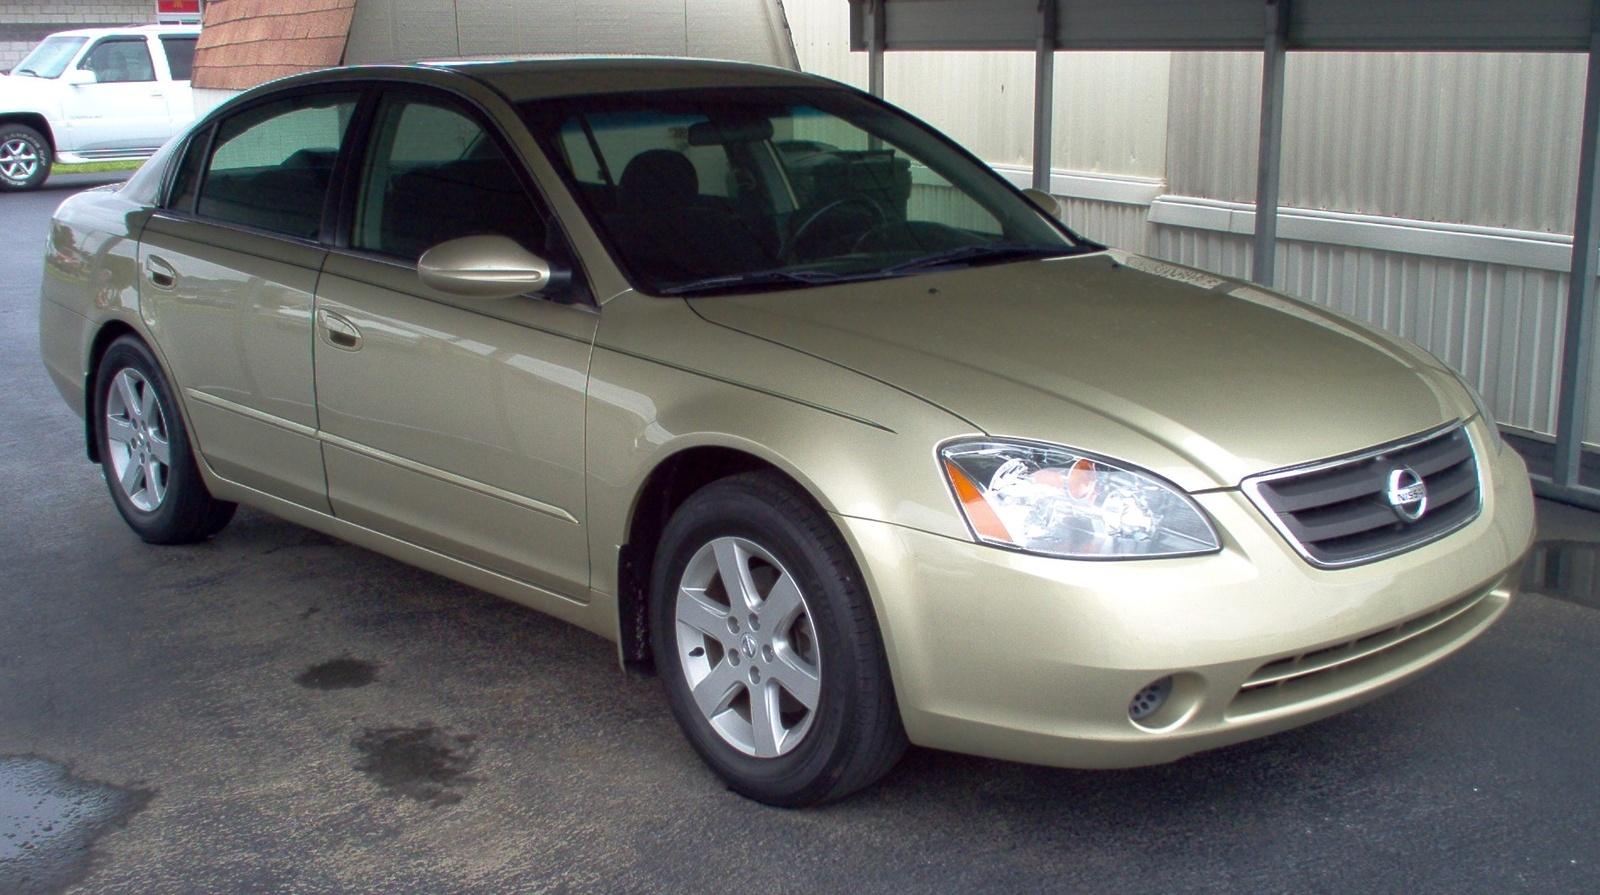 2003 White Altima Nissan